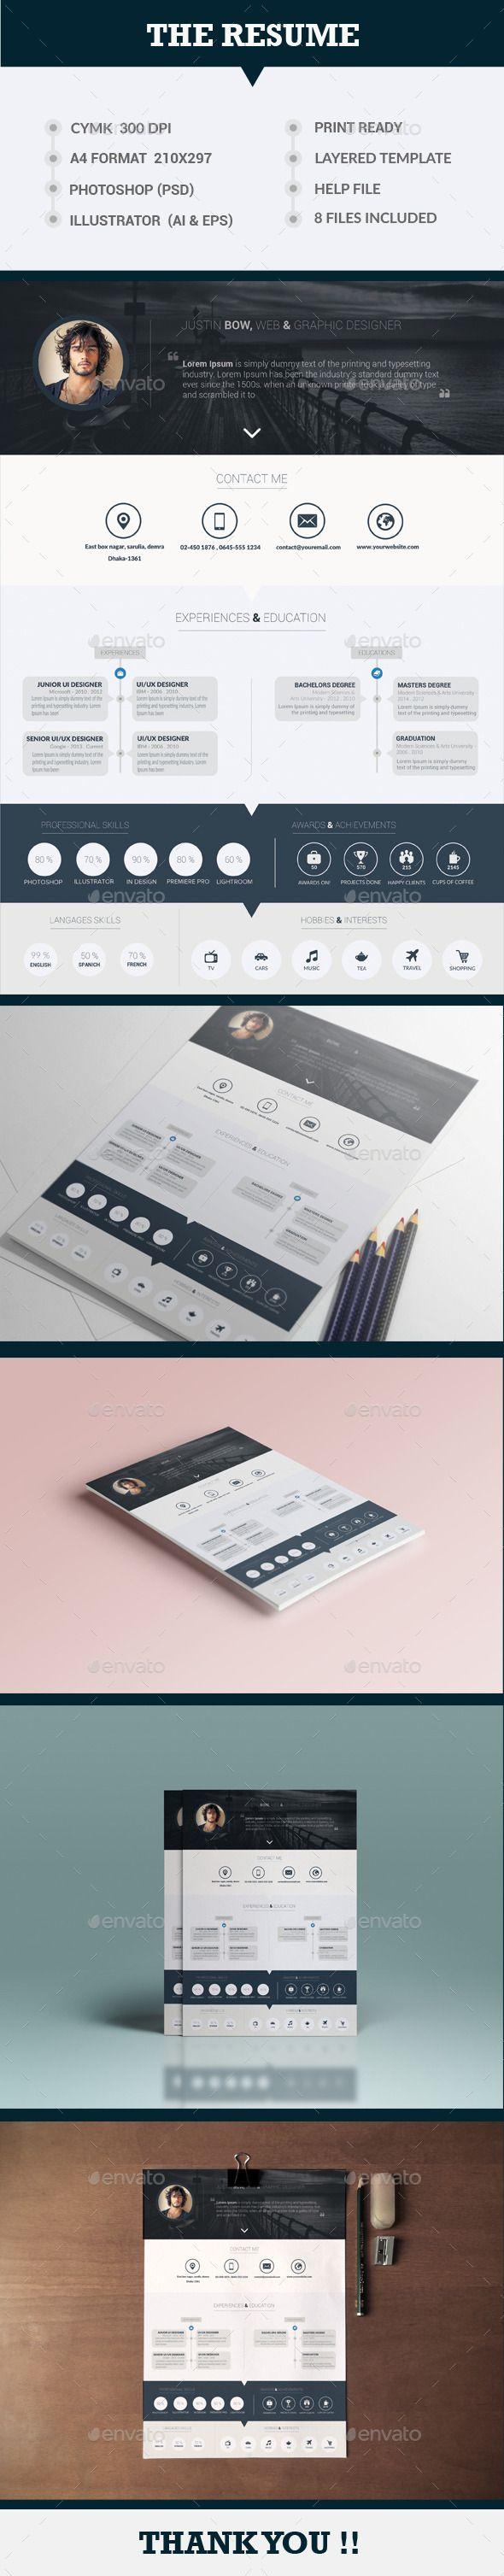 208 best CV images on Pinterest | Cv template, Resume and Resume design